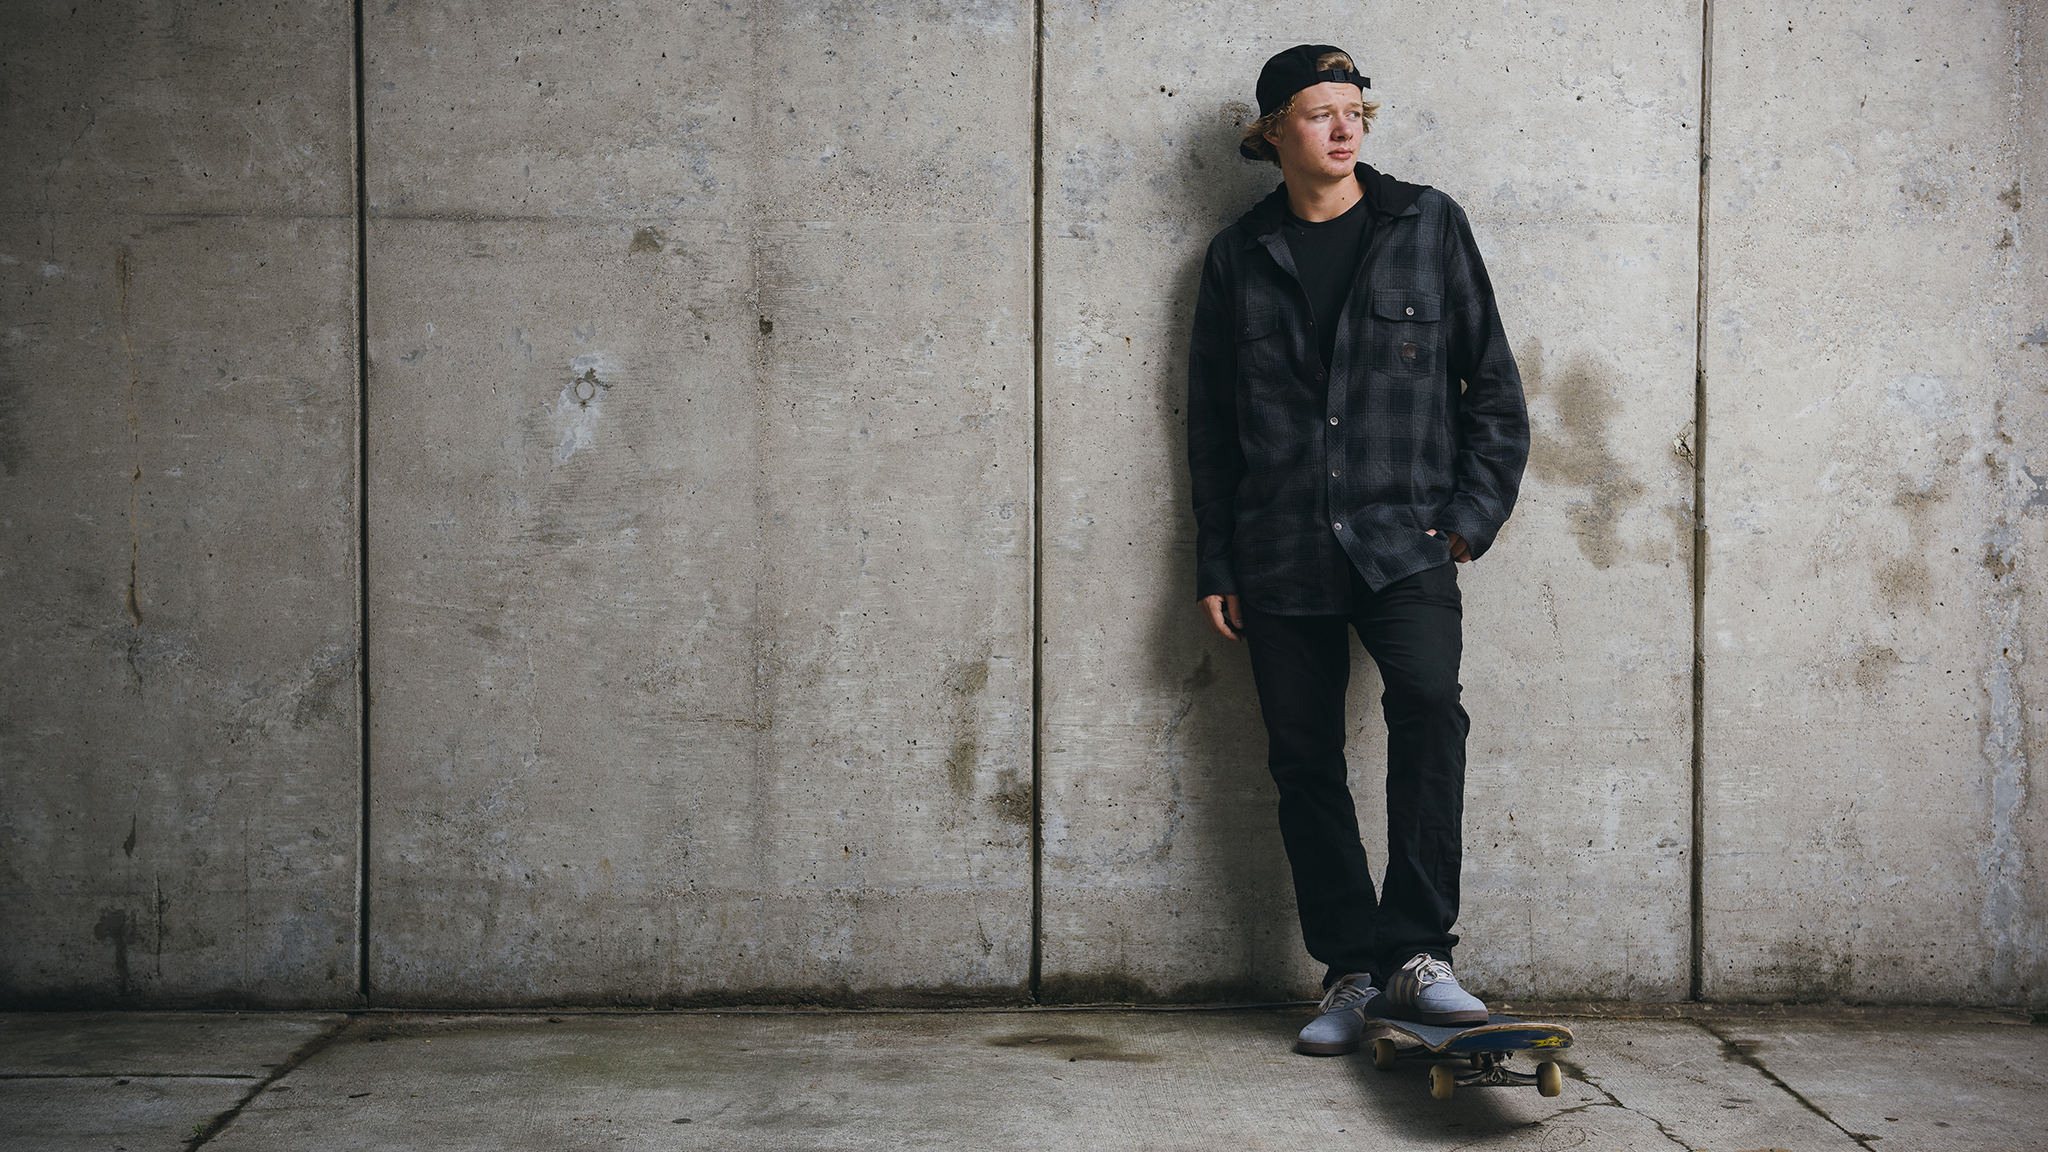 Mens Street Louie Lopez Deck Skateboard Flip Louis Whos Skating At X Games Oslo 2016